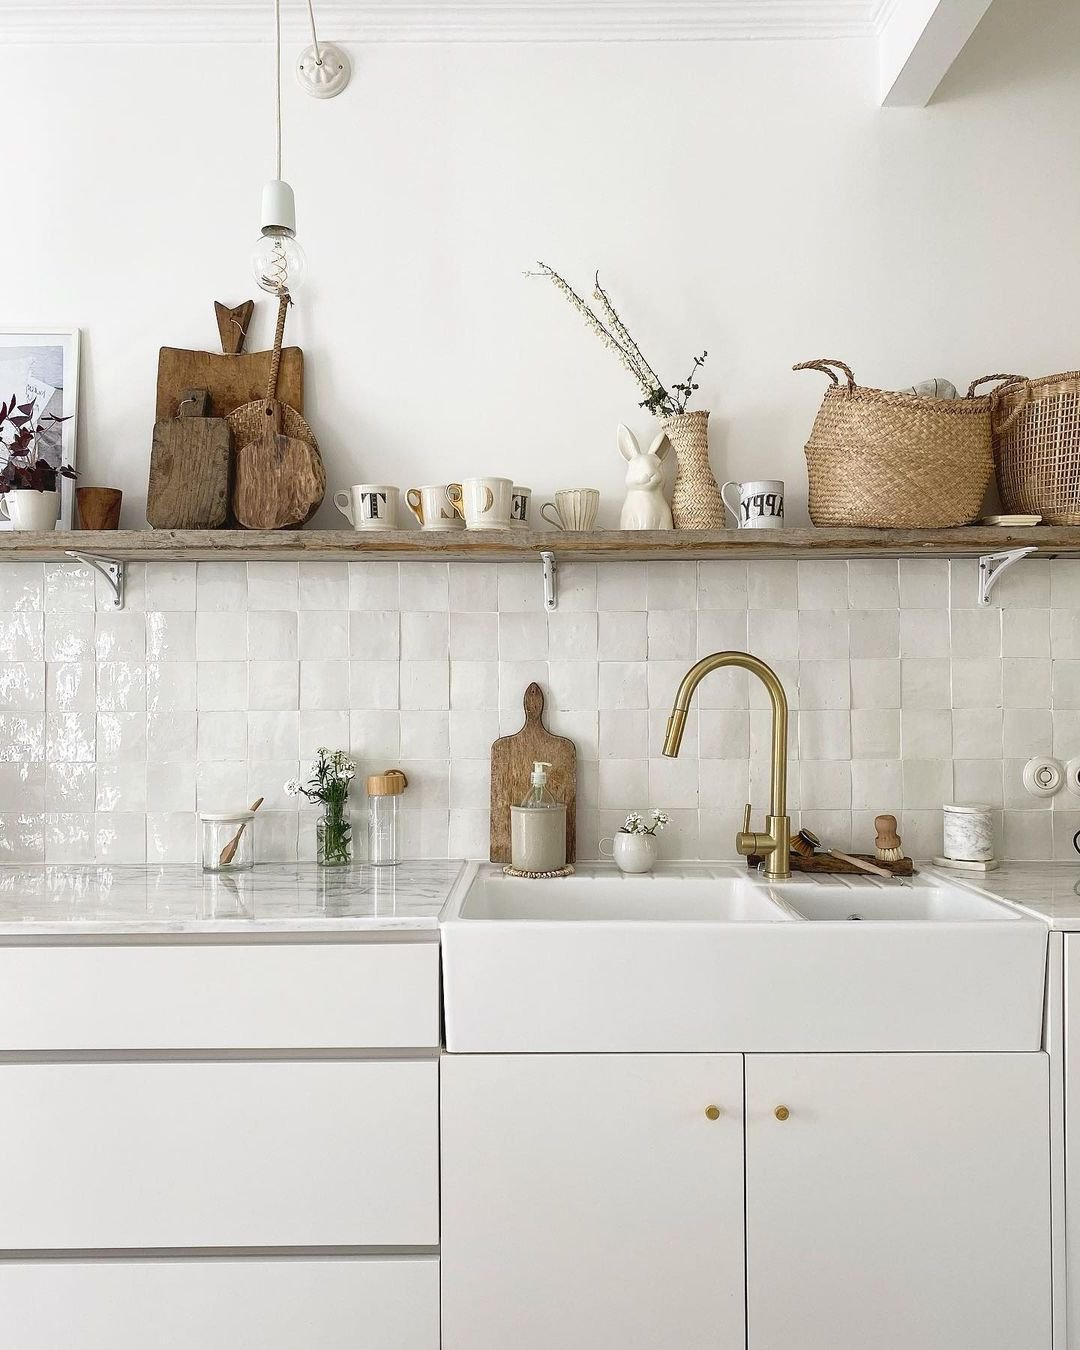 cuisine ouverte retro style campagne blanche bois